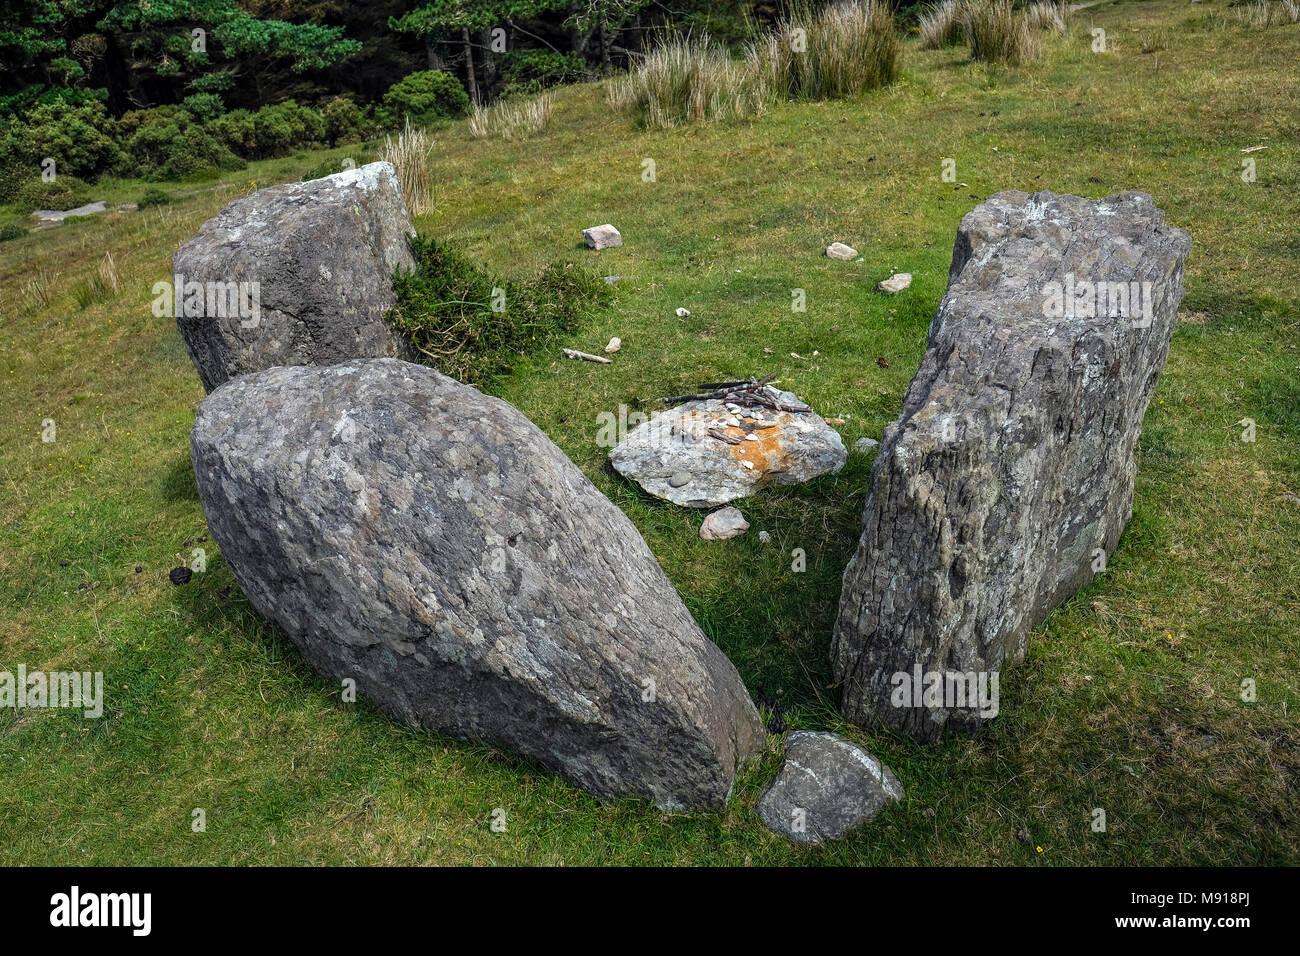 Ireland. Ardgroom Stone Circle. Beara Peninsula. Remnants of rituals of 'modern celts'. - Stock Image